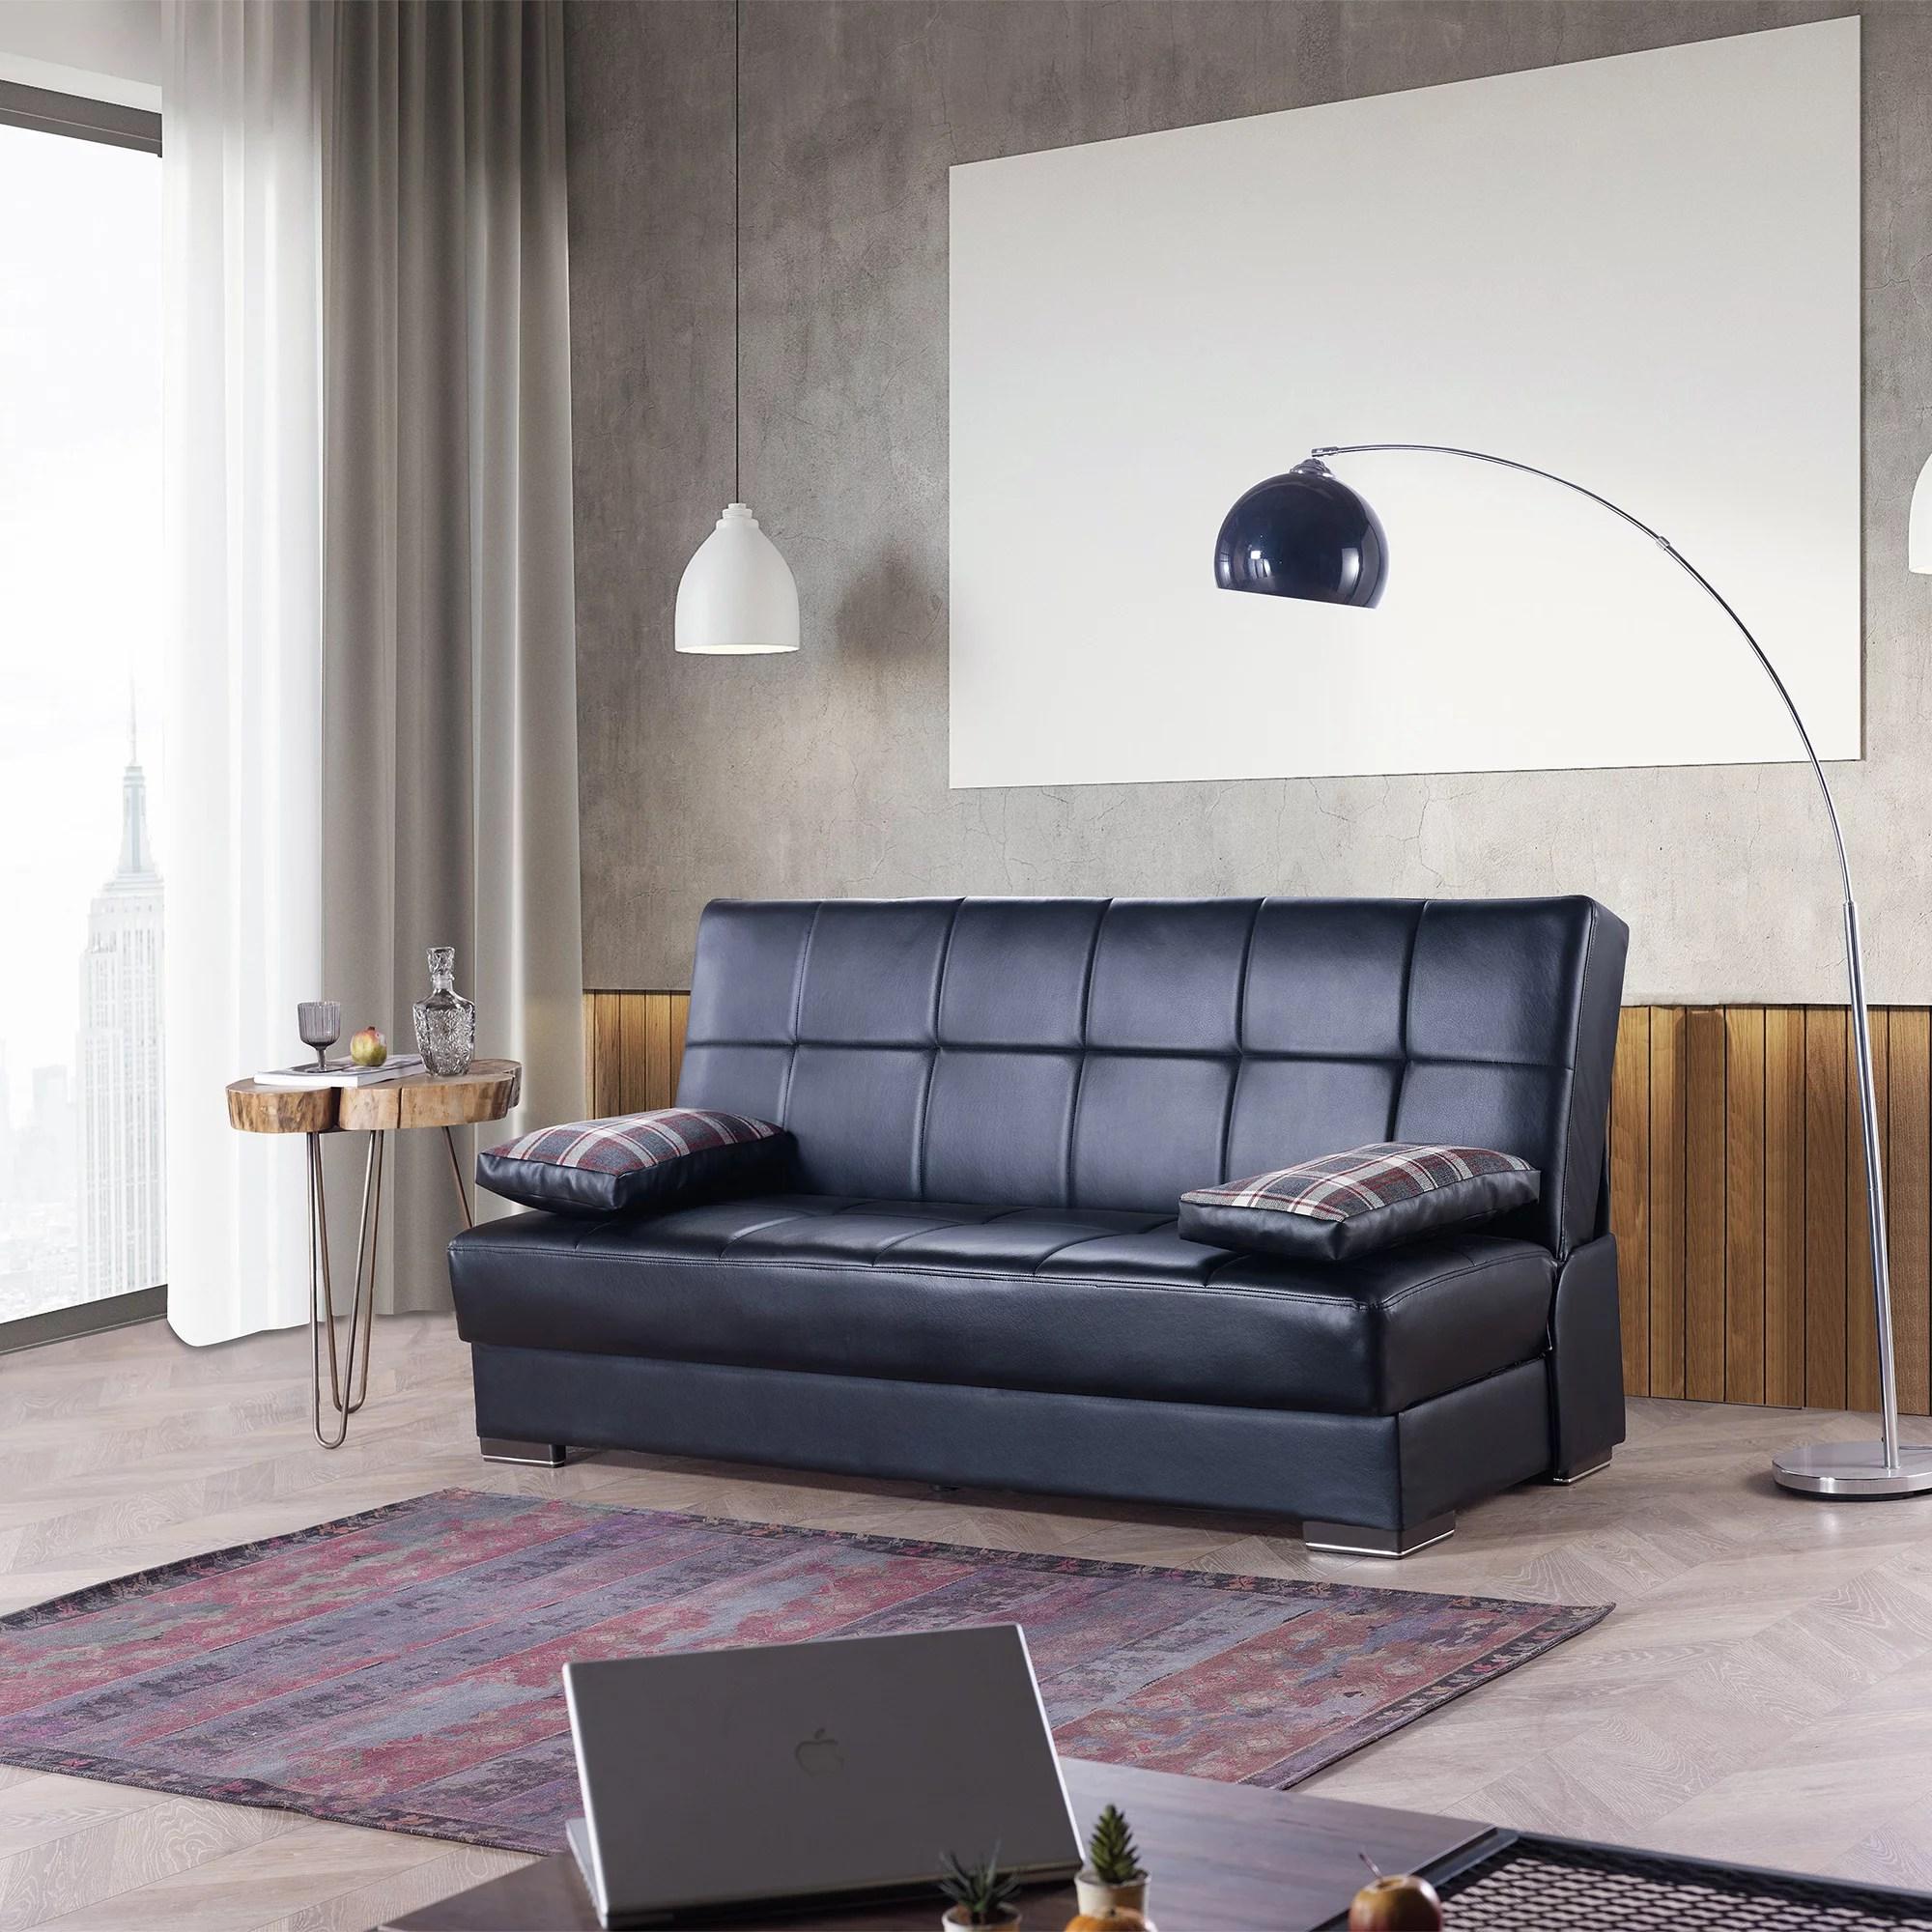 soho armless leather sleeper sofa bed with storage